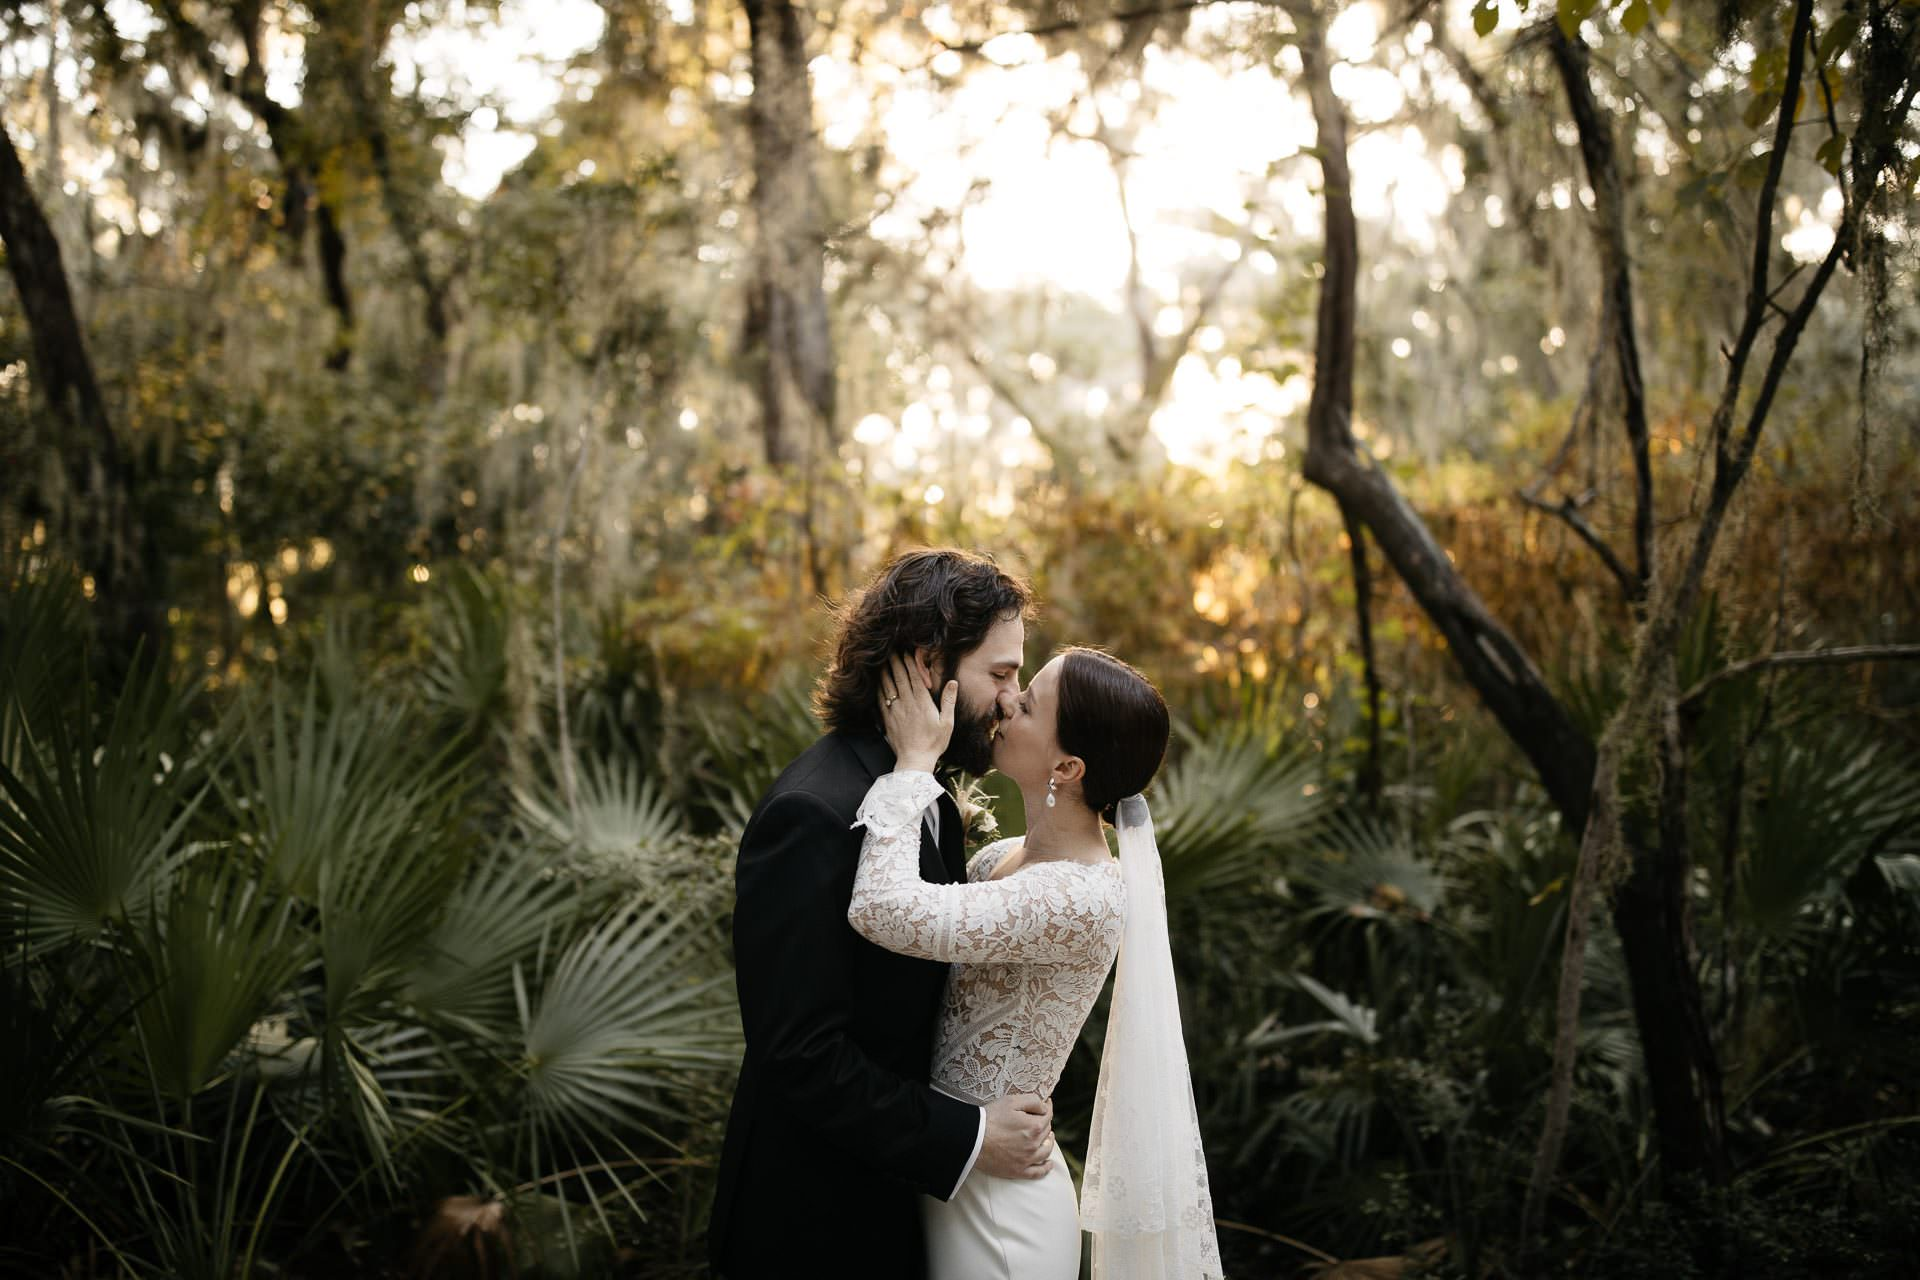 Tara & Sean's Wedding . Amelia Island, Florida